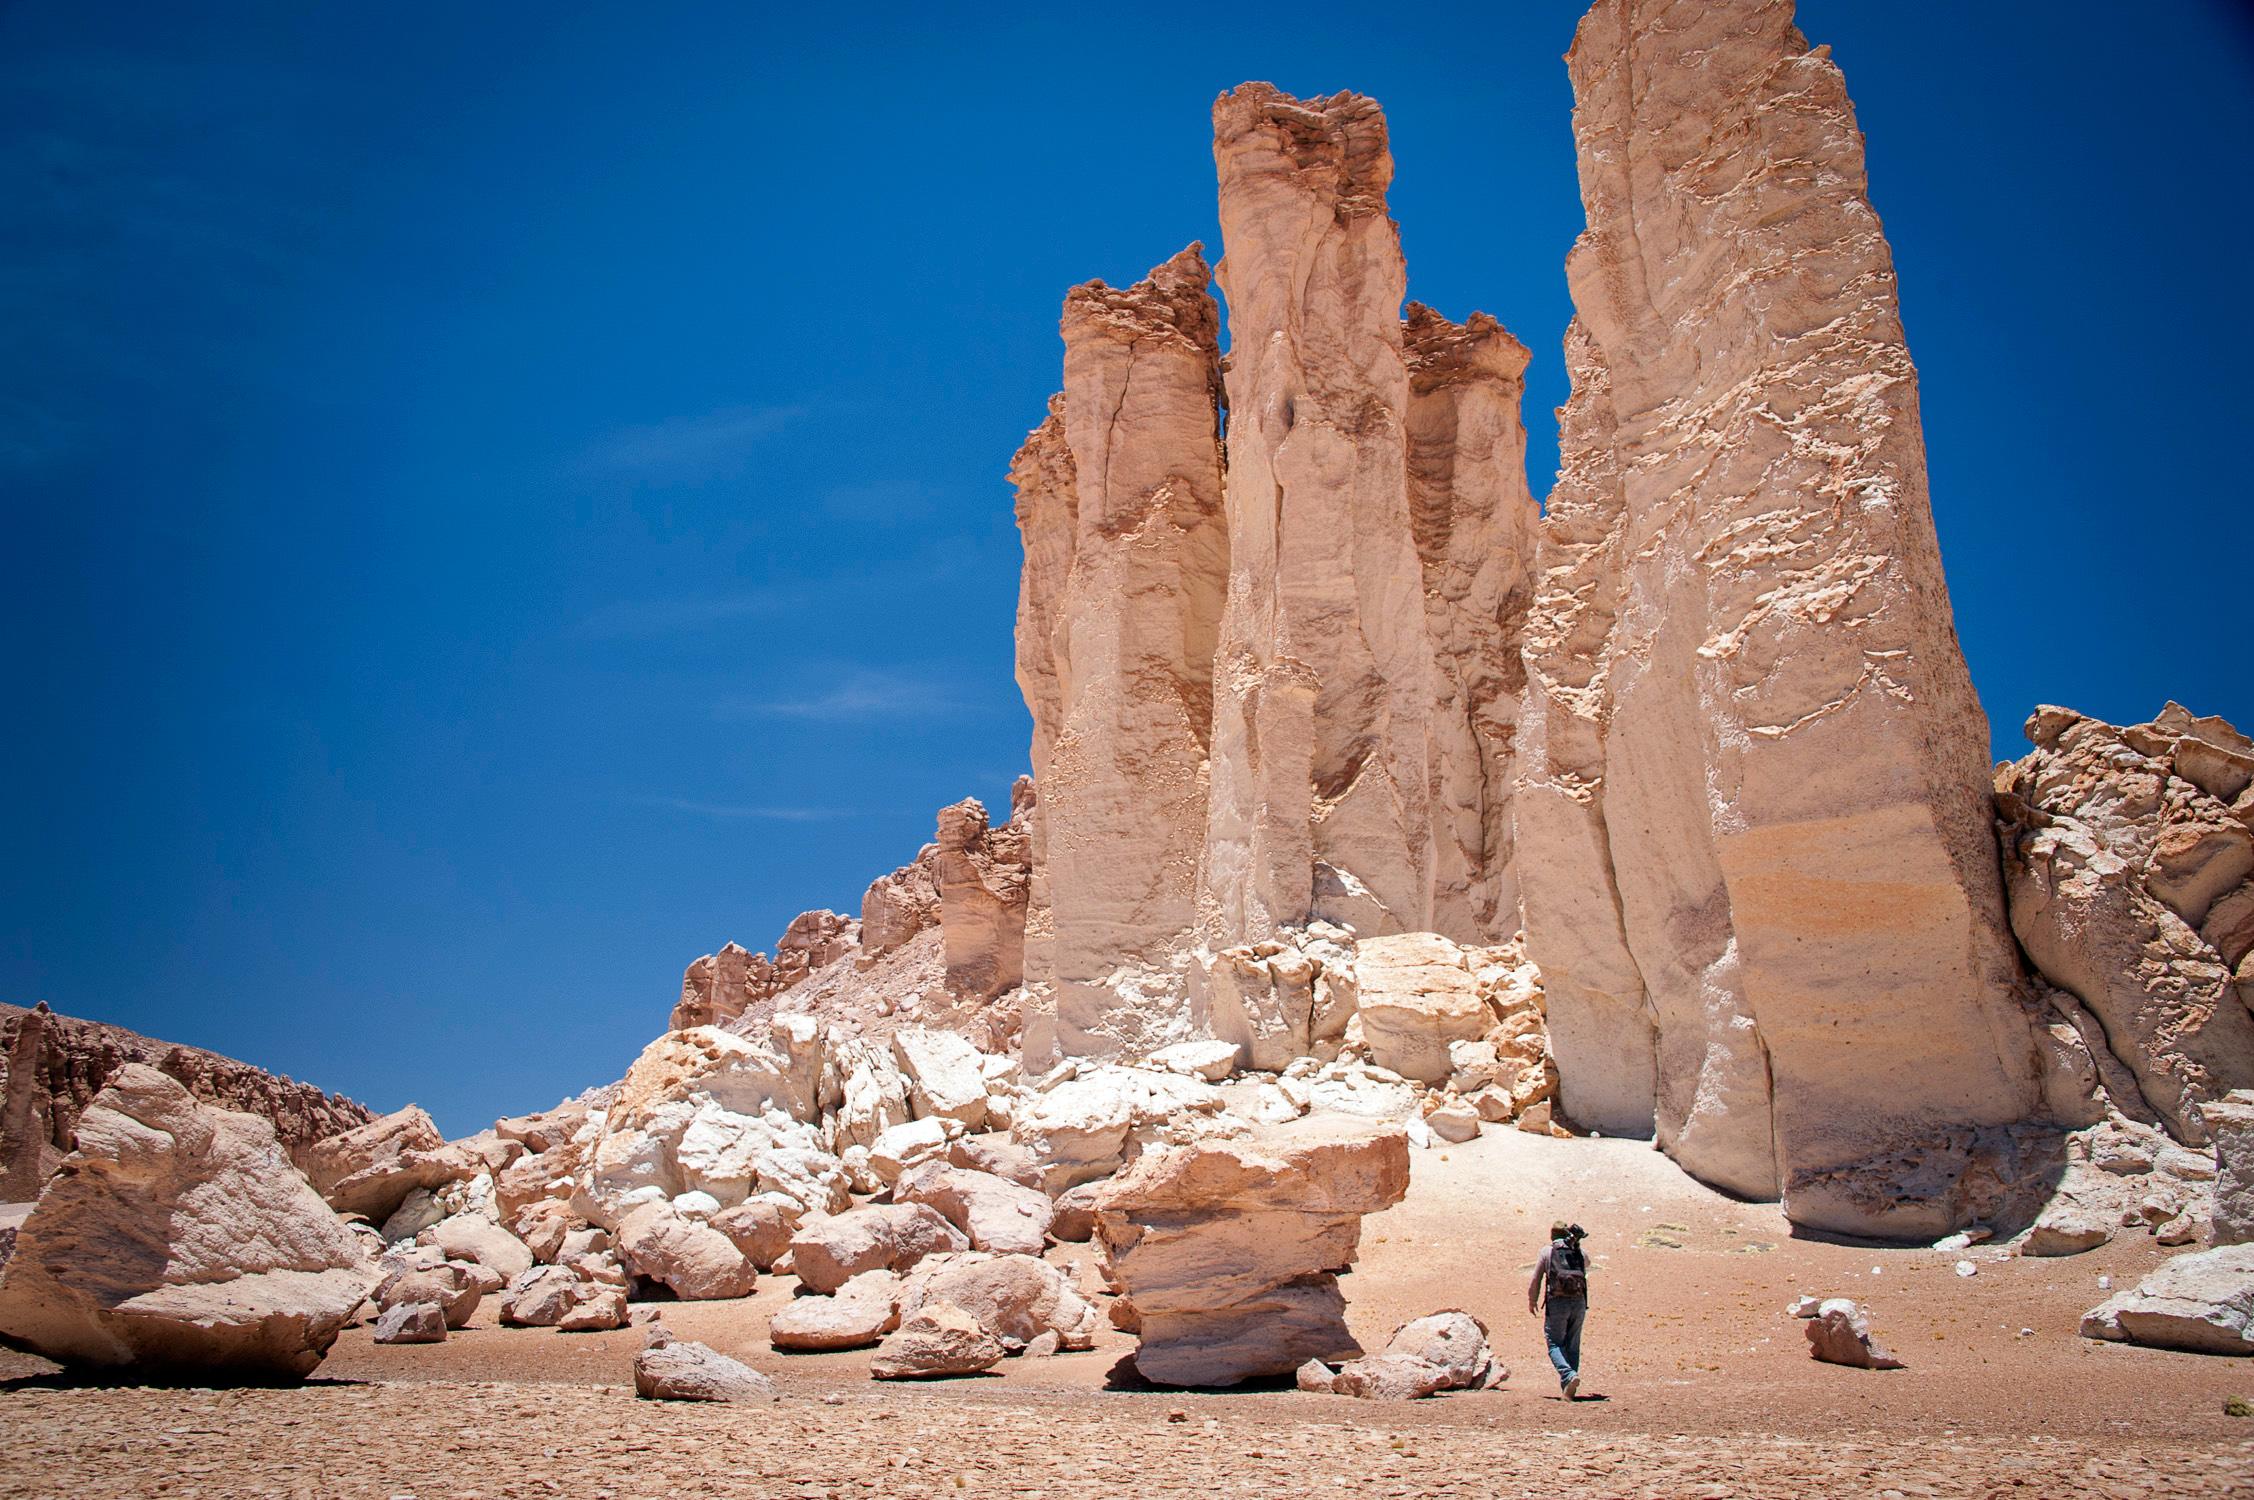 Turkey Wallpaper Cute Have A Wonderful Bohemian Adventure In Atacama Desert